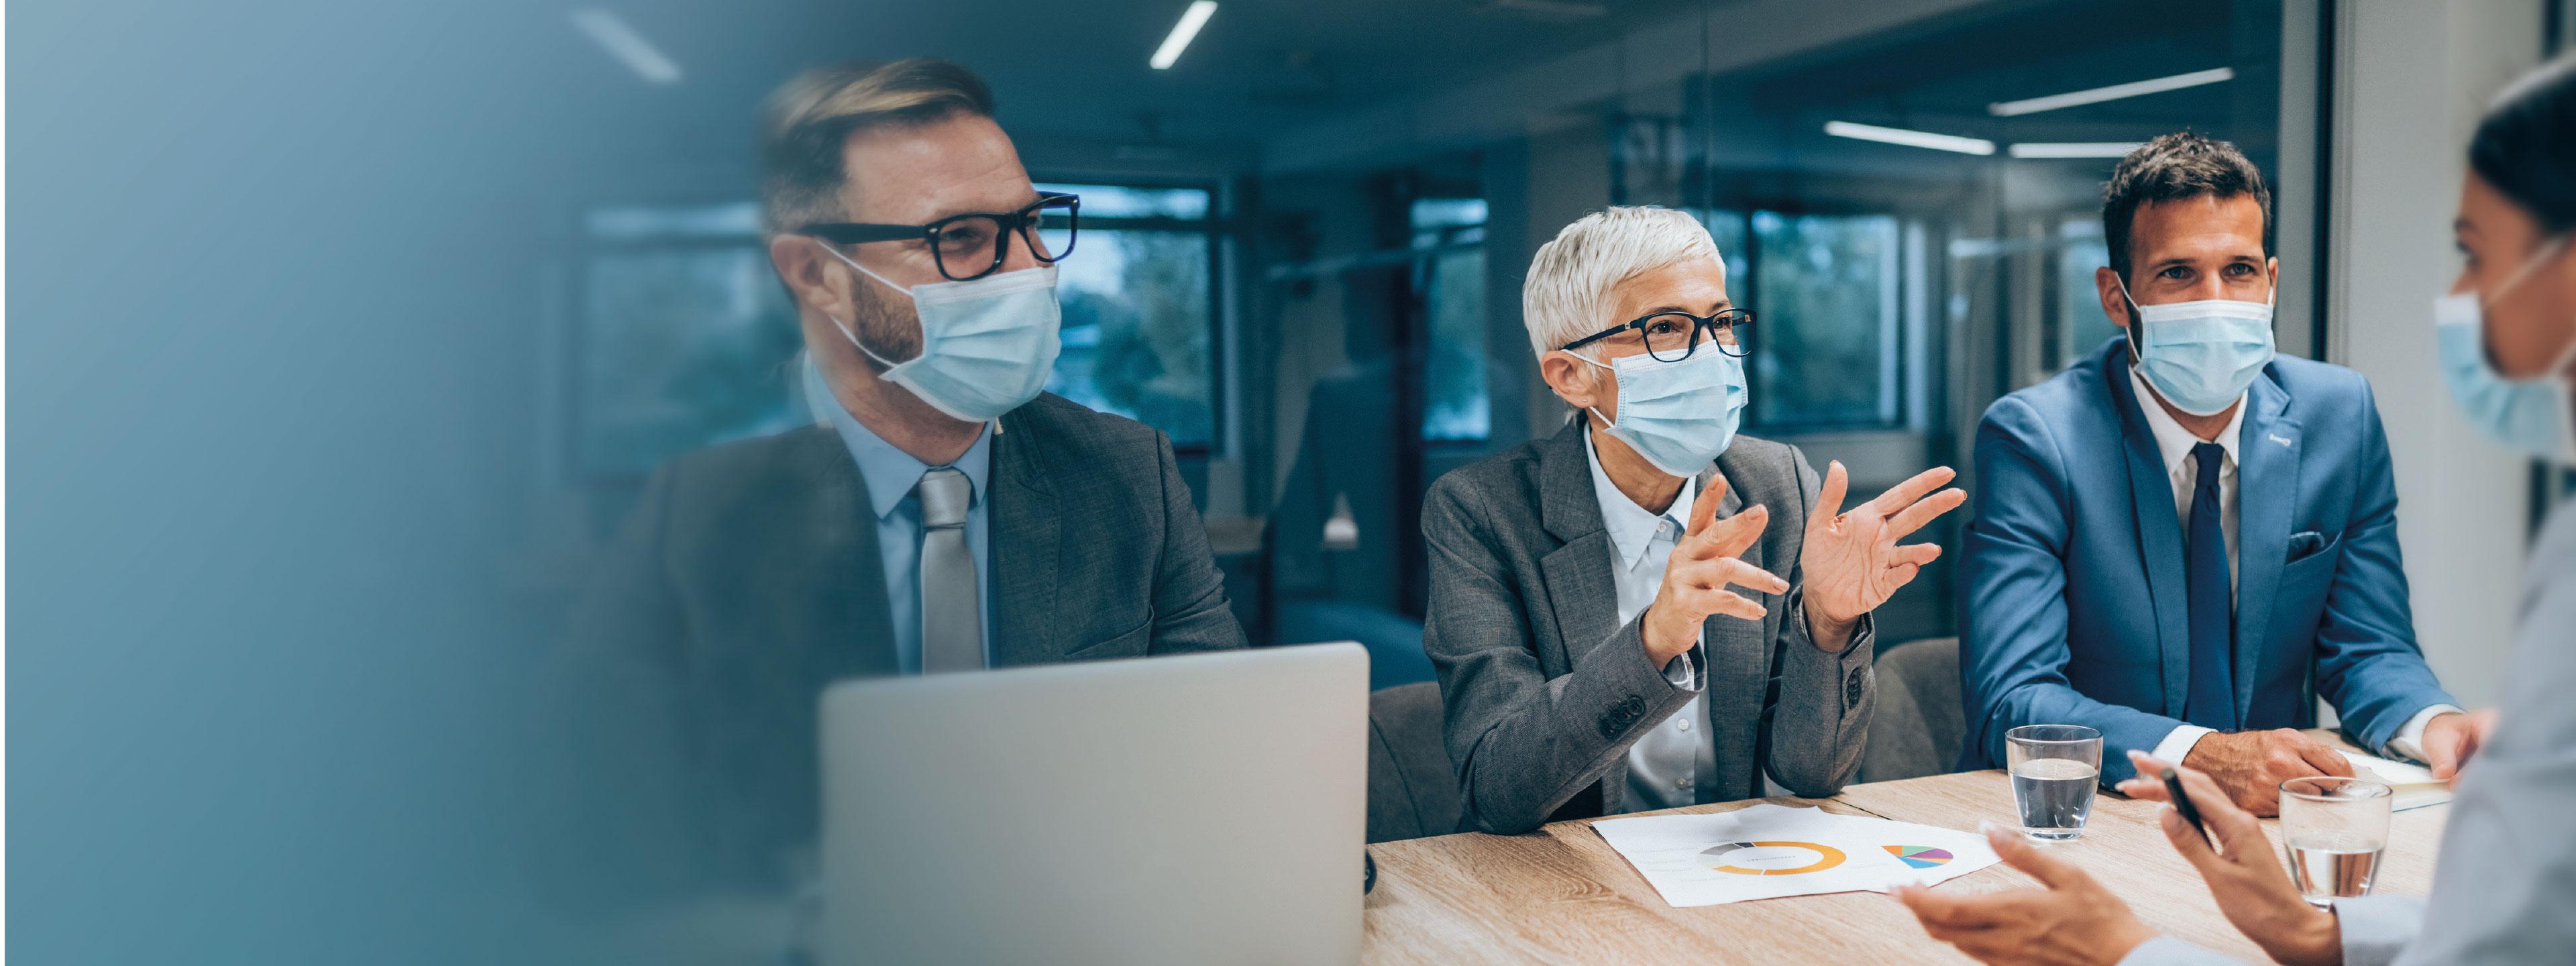 Raport Wolters Kluwer Future Ready Lawyer 2021 - W cieniu pandemii